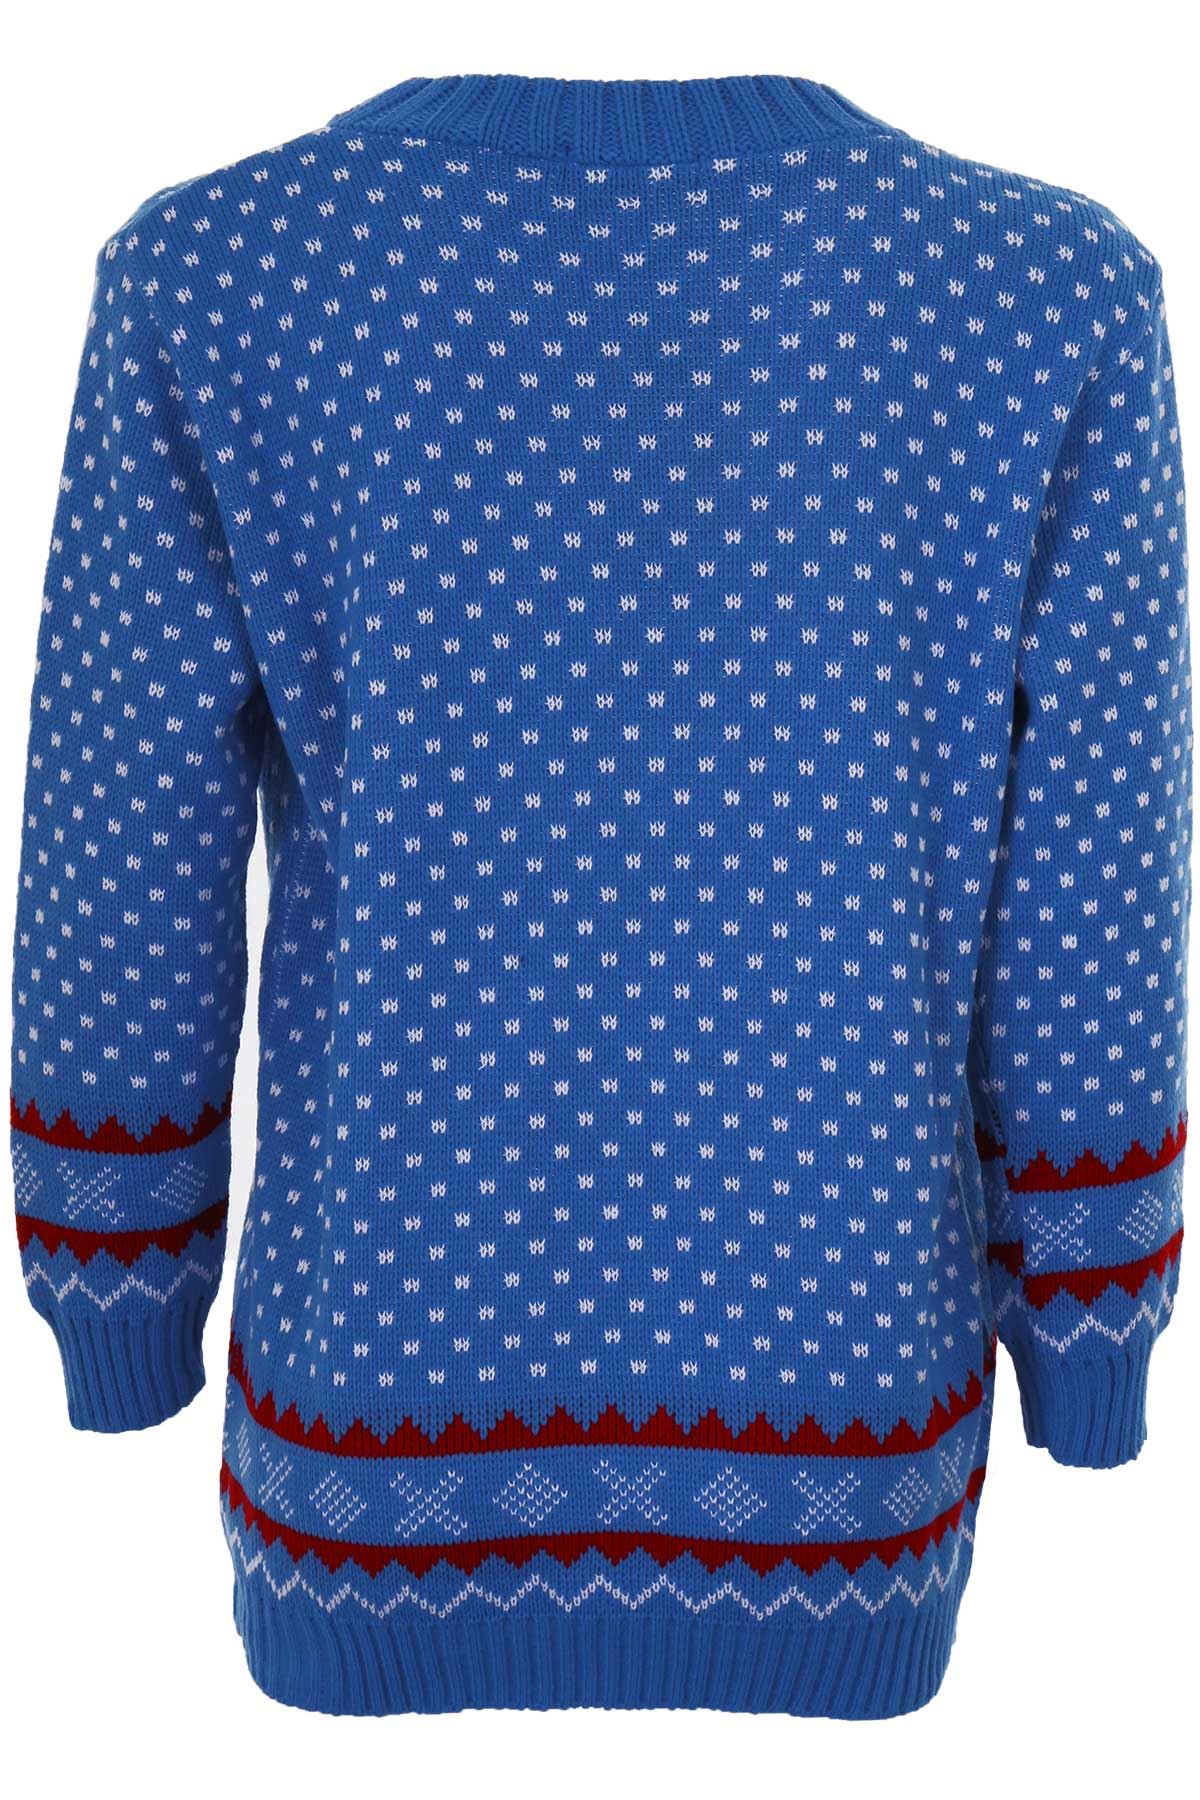 Knitting Pattern For Olaf Jumper : Womens Santa Reindeer Snow Minion Olaf Ladies Knitted ...